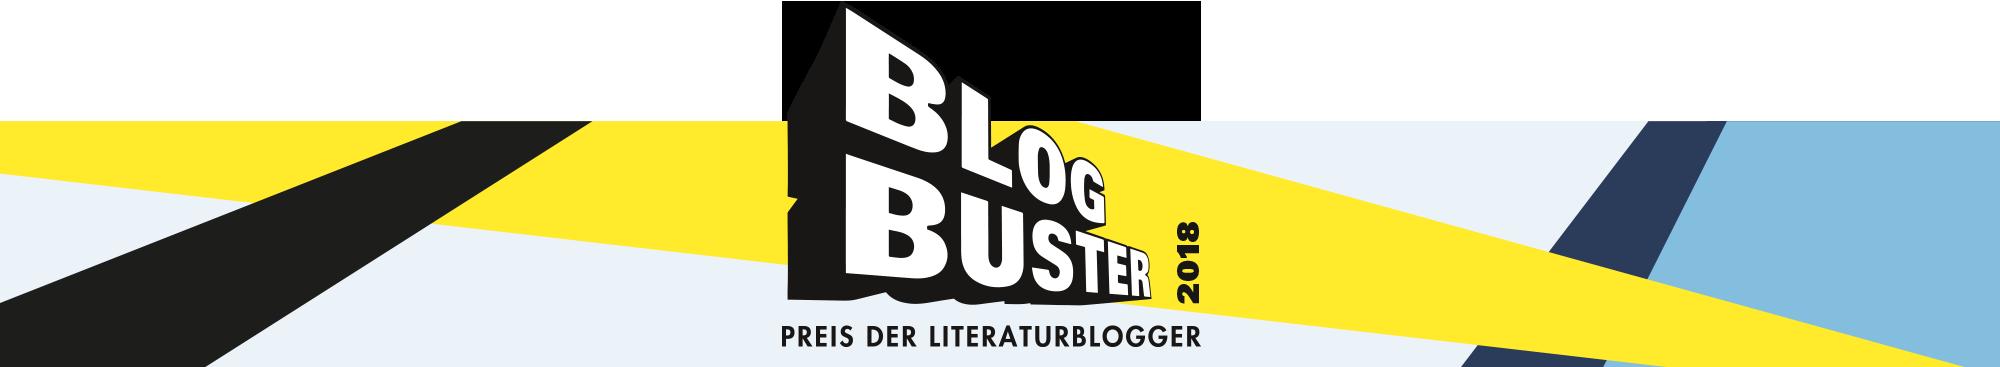 blogbuster – Seite 2 – Blogbuster